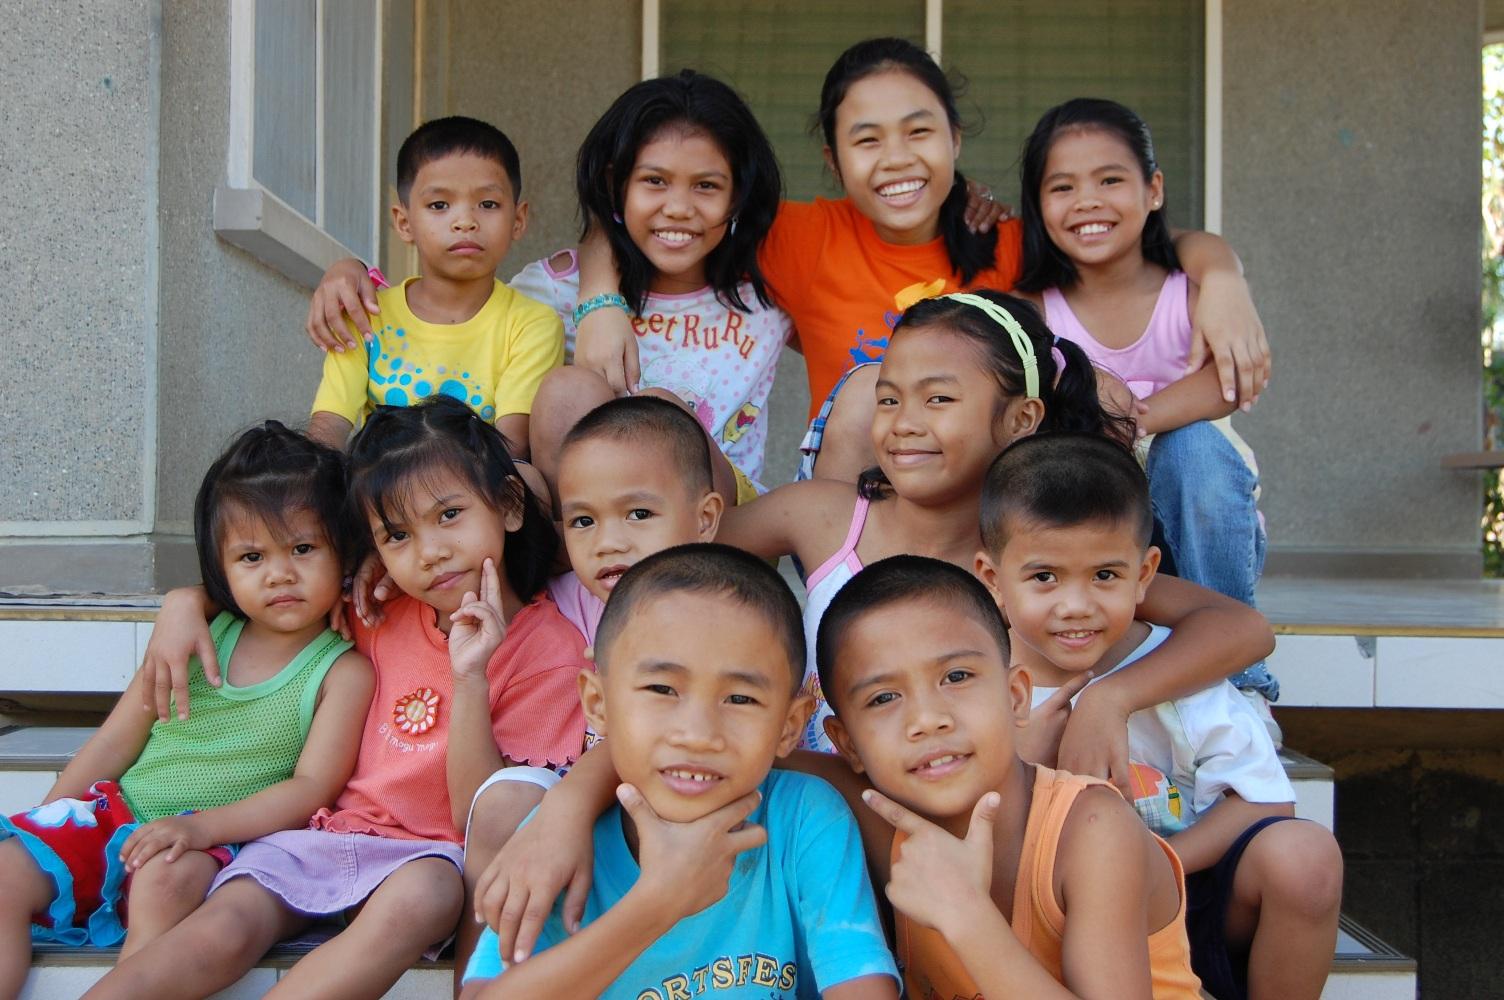 filipino kids - photo #30